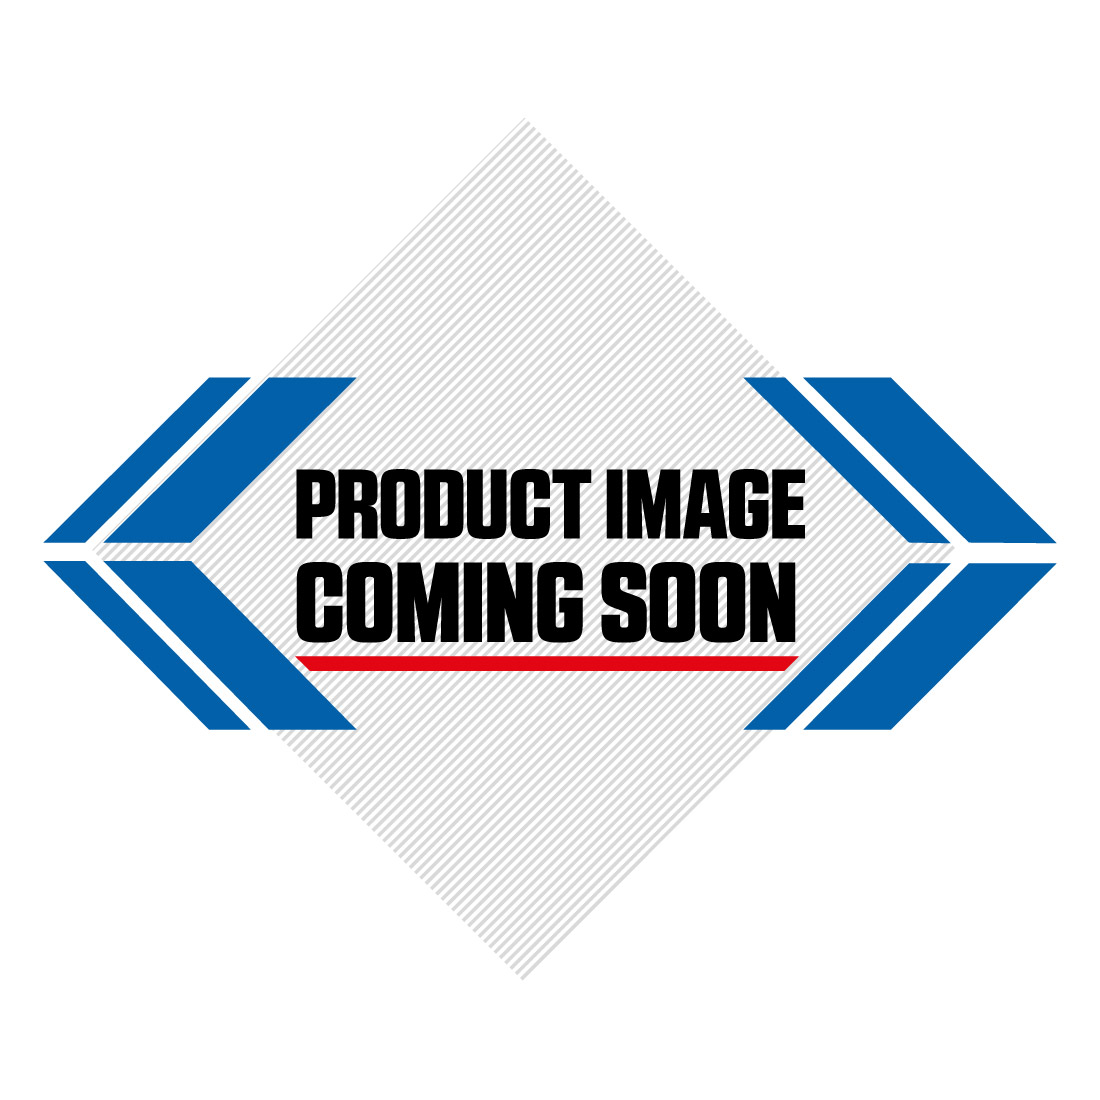 Suzuki Plastic Kit RMZ 450 (11-12) OEM Factory Image-3